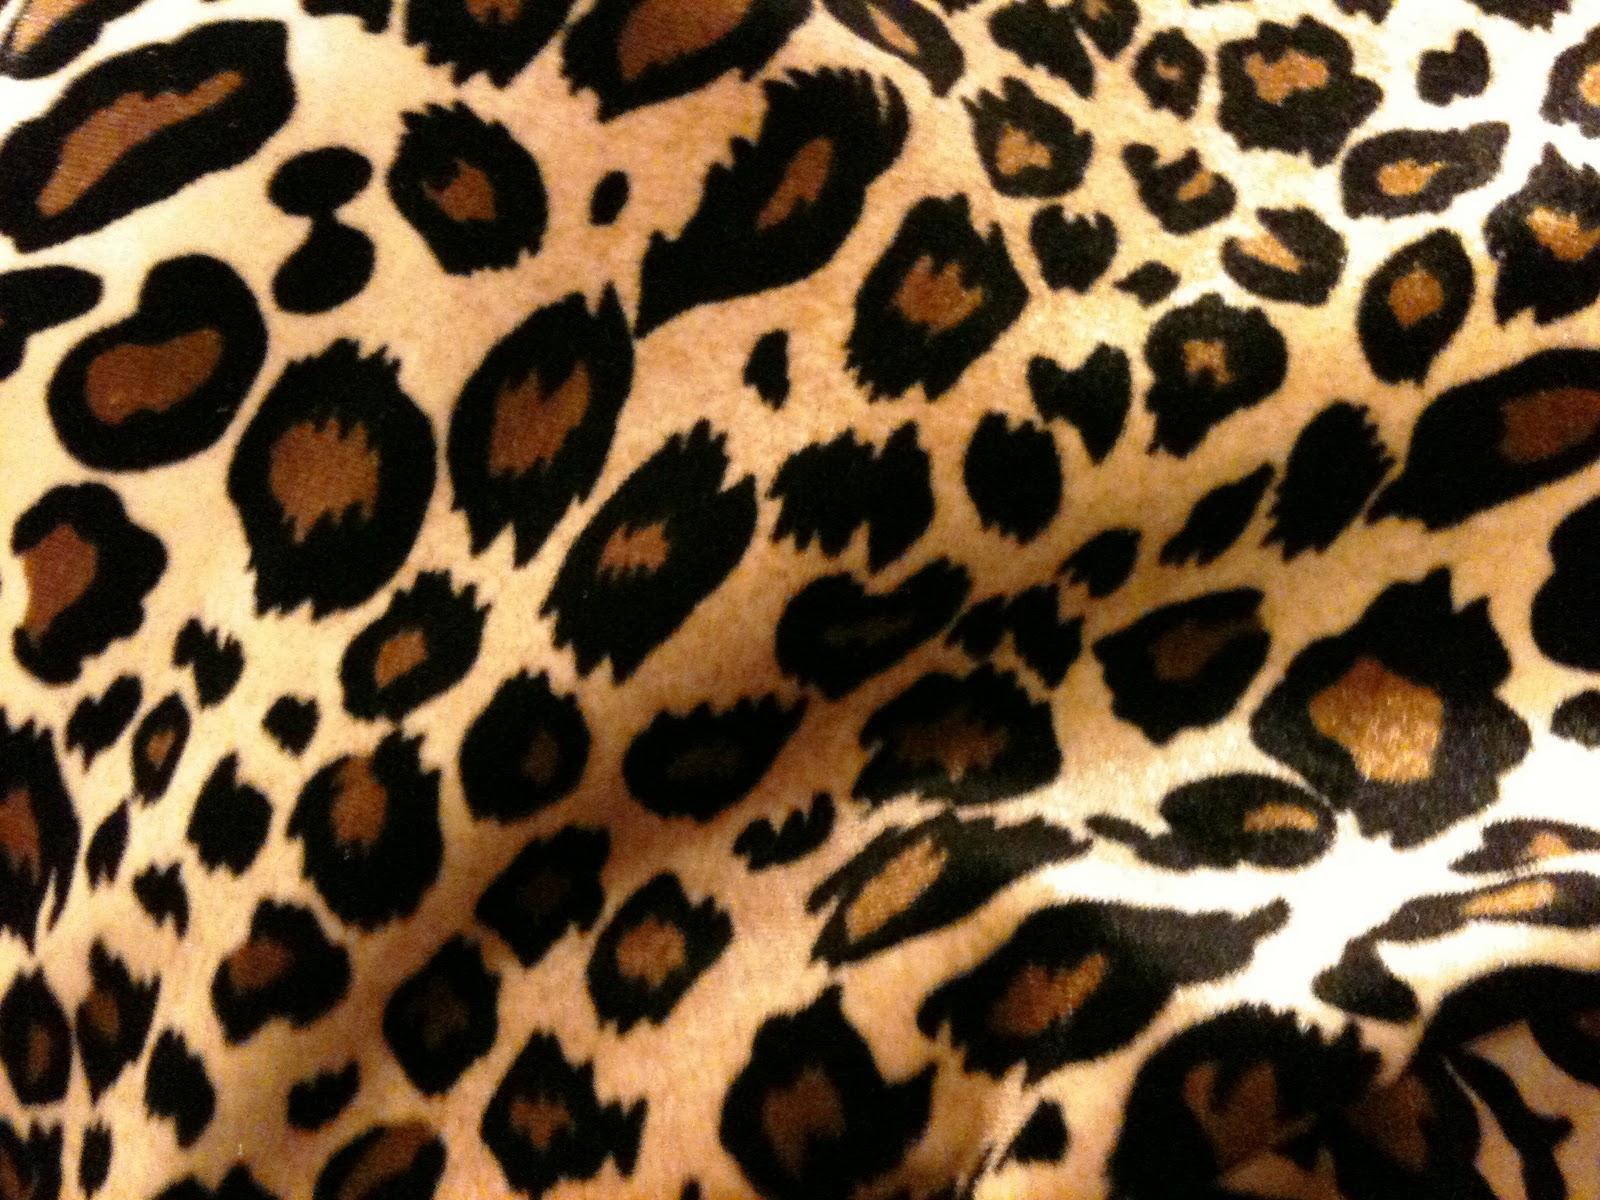 [70+] Cheetah Background Pictures On WallpaperSafari